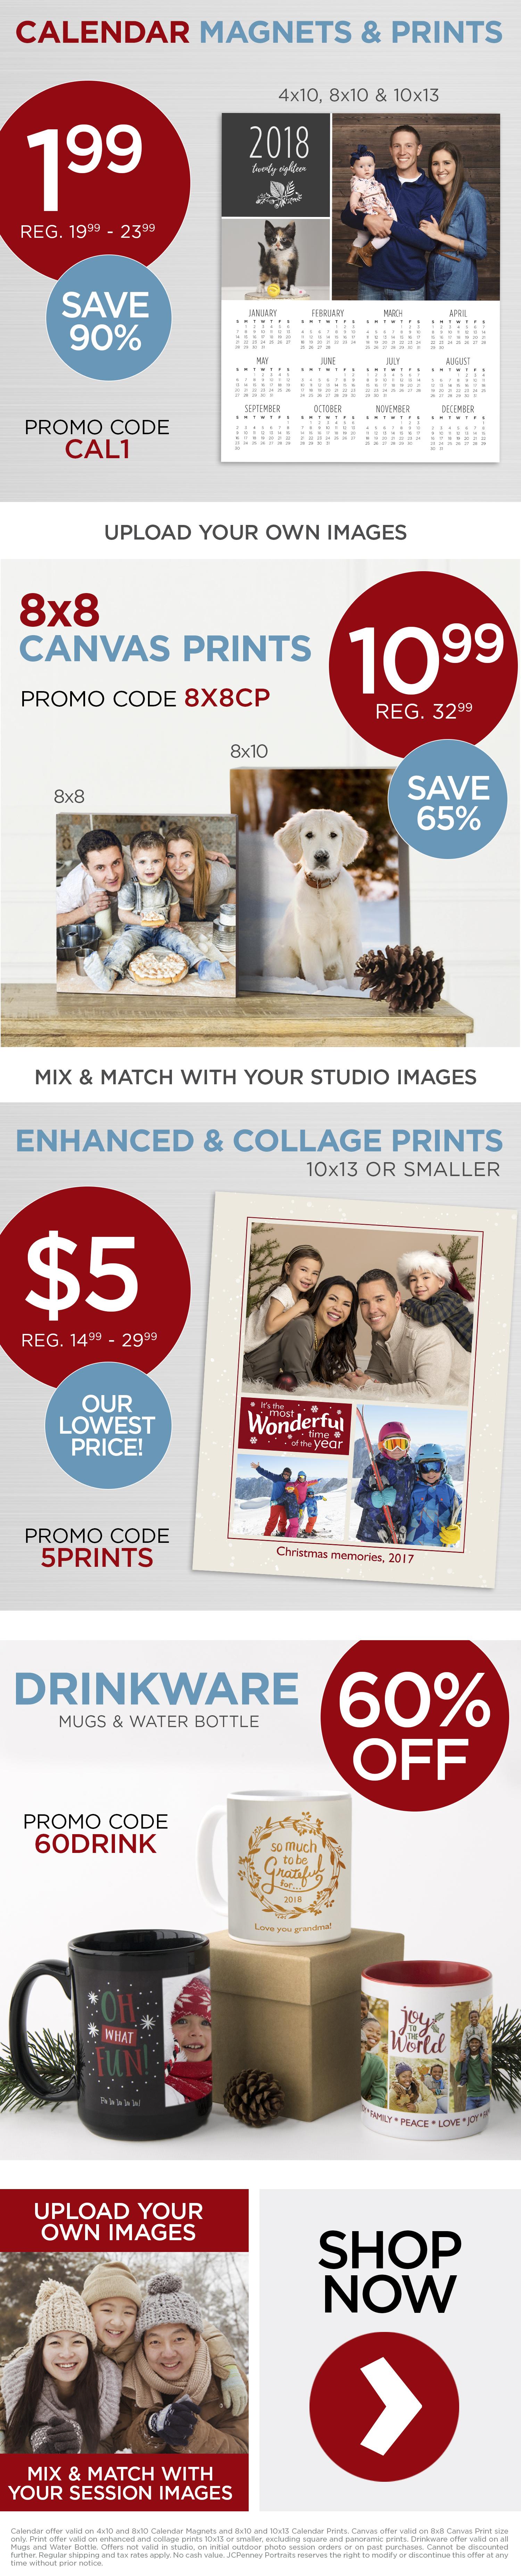 Calendar Magnets and Prints $1.99